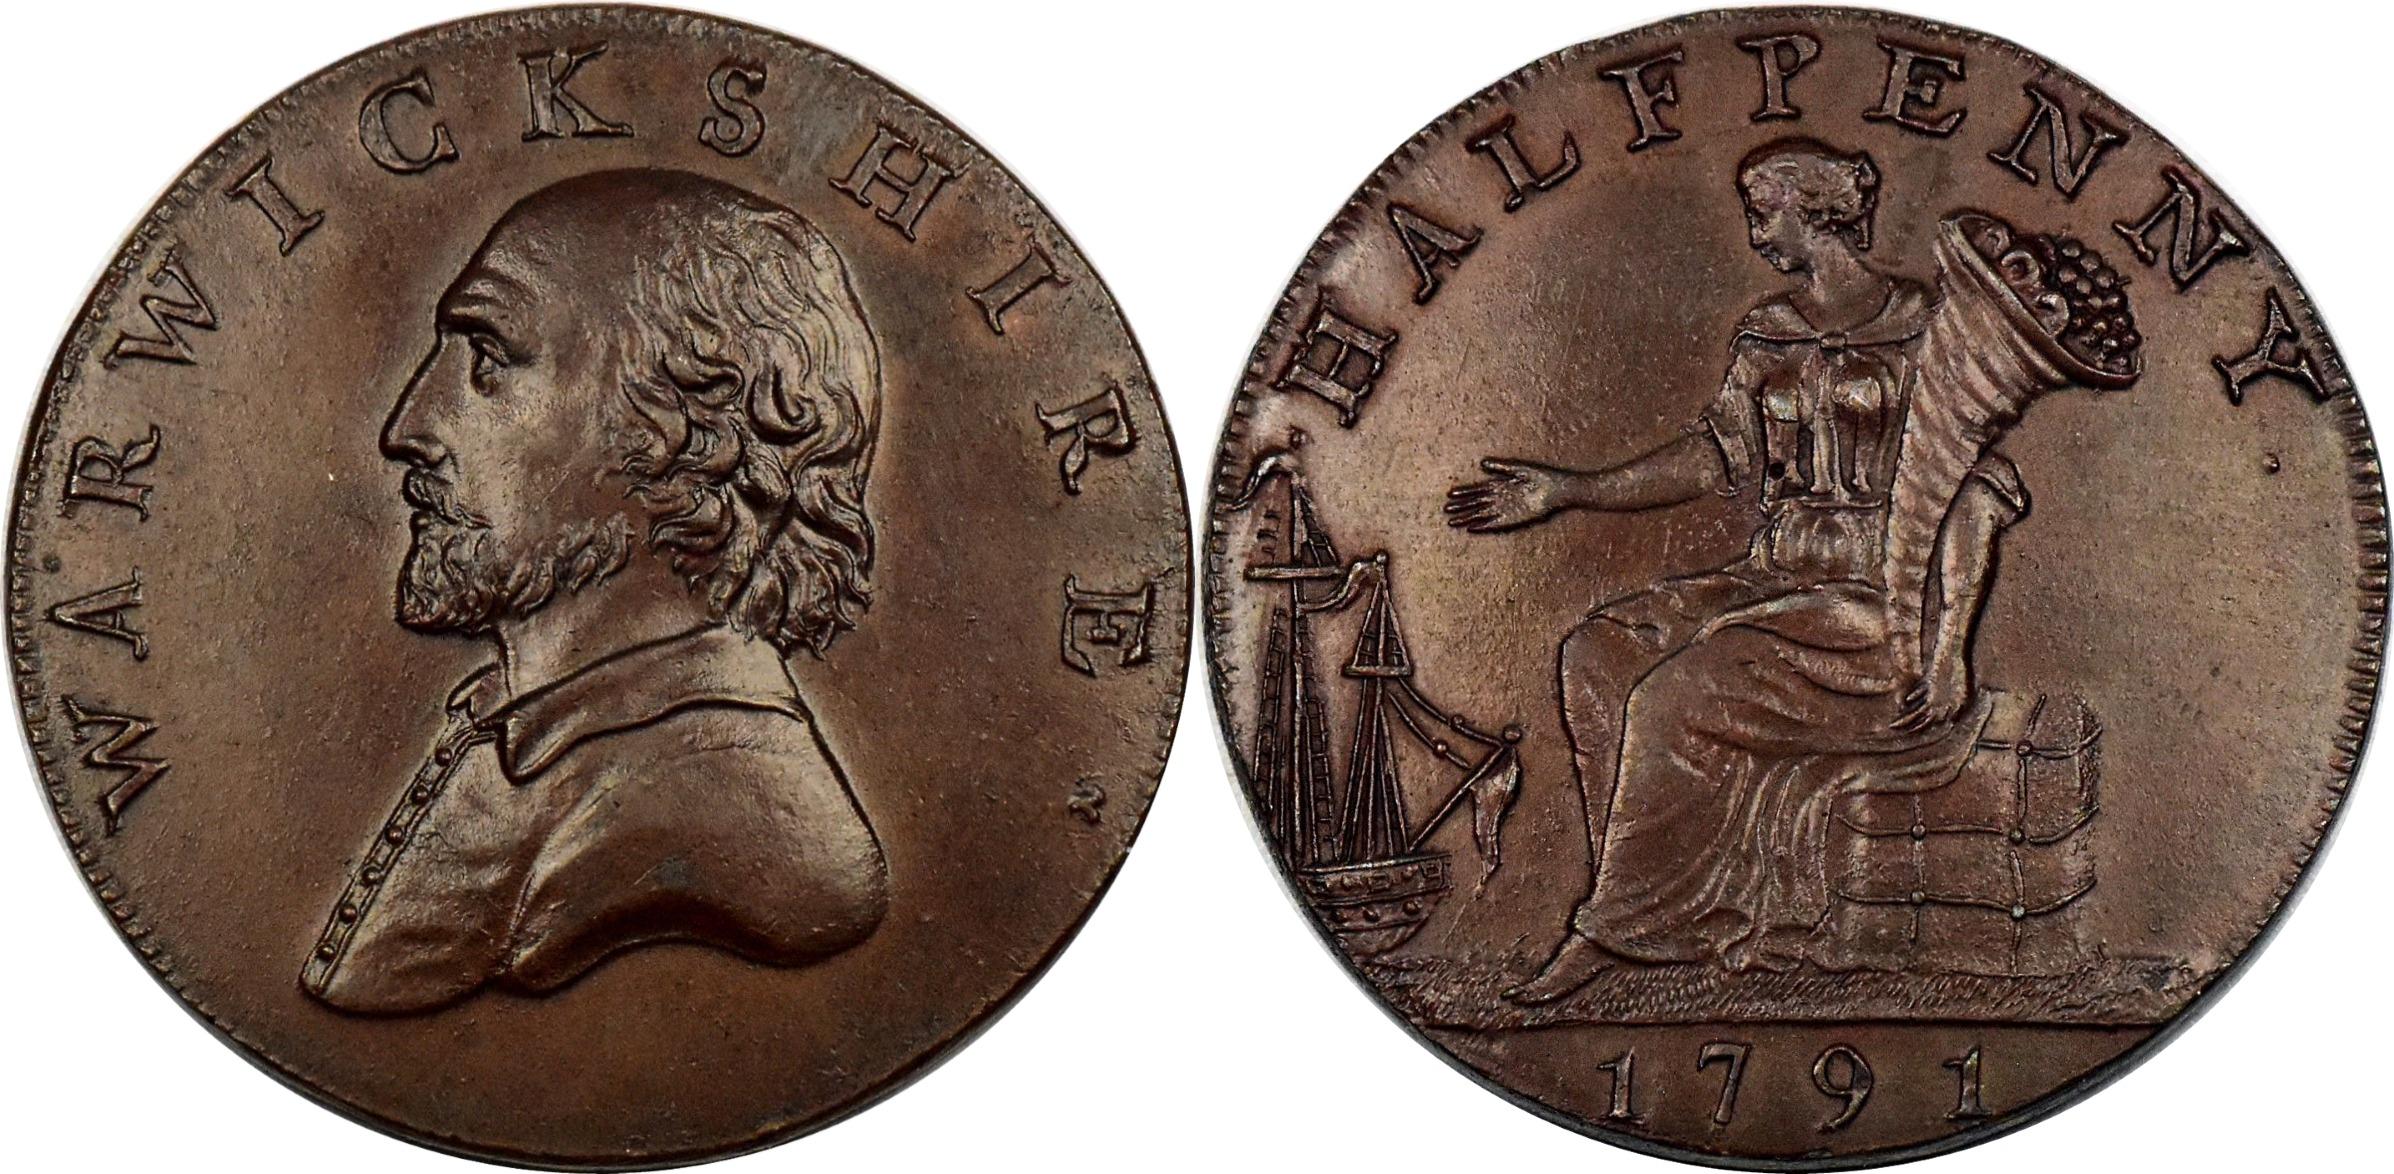 1791_hp_warwickshire_county_dh_45_02_sellers_druids_revenge.jpg